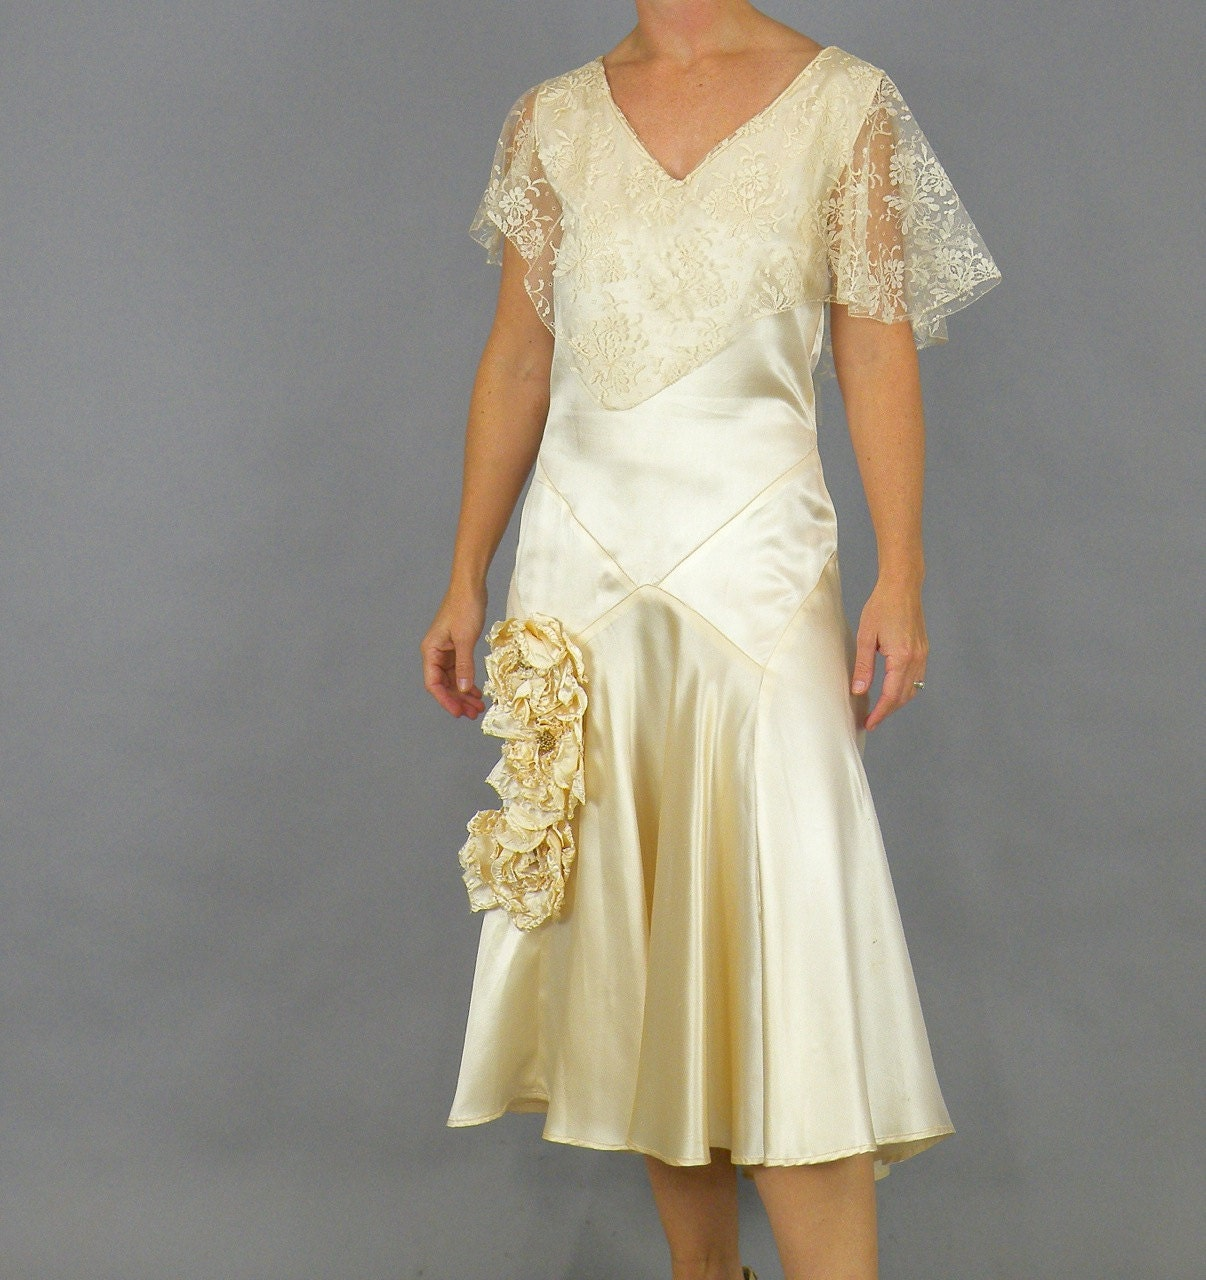 Antique 18s Wedding Dress, 18s Dress, 18s Candlelight Satin Lace Dress  with 18D Flowers, Original Bridal Portrait & Netting